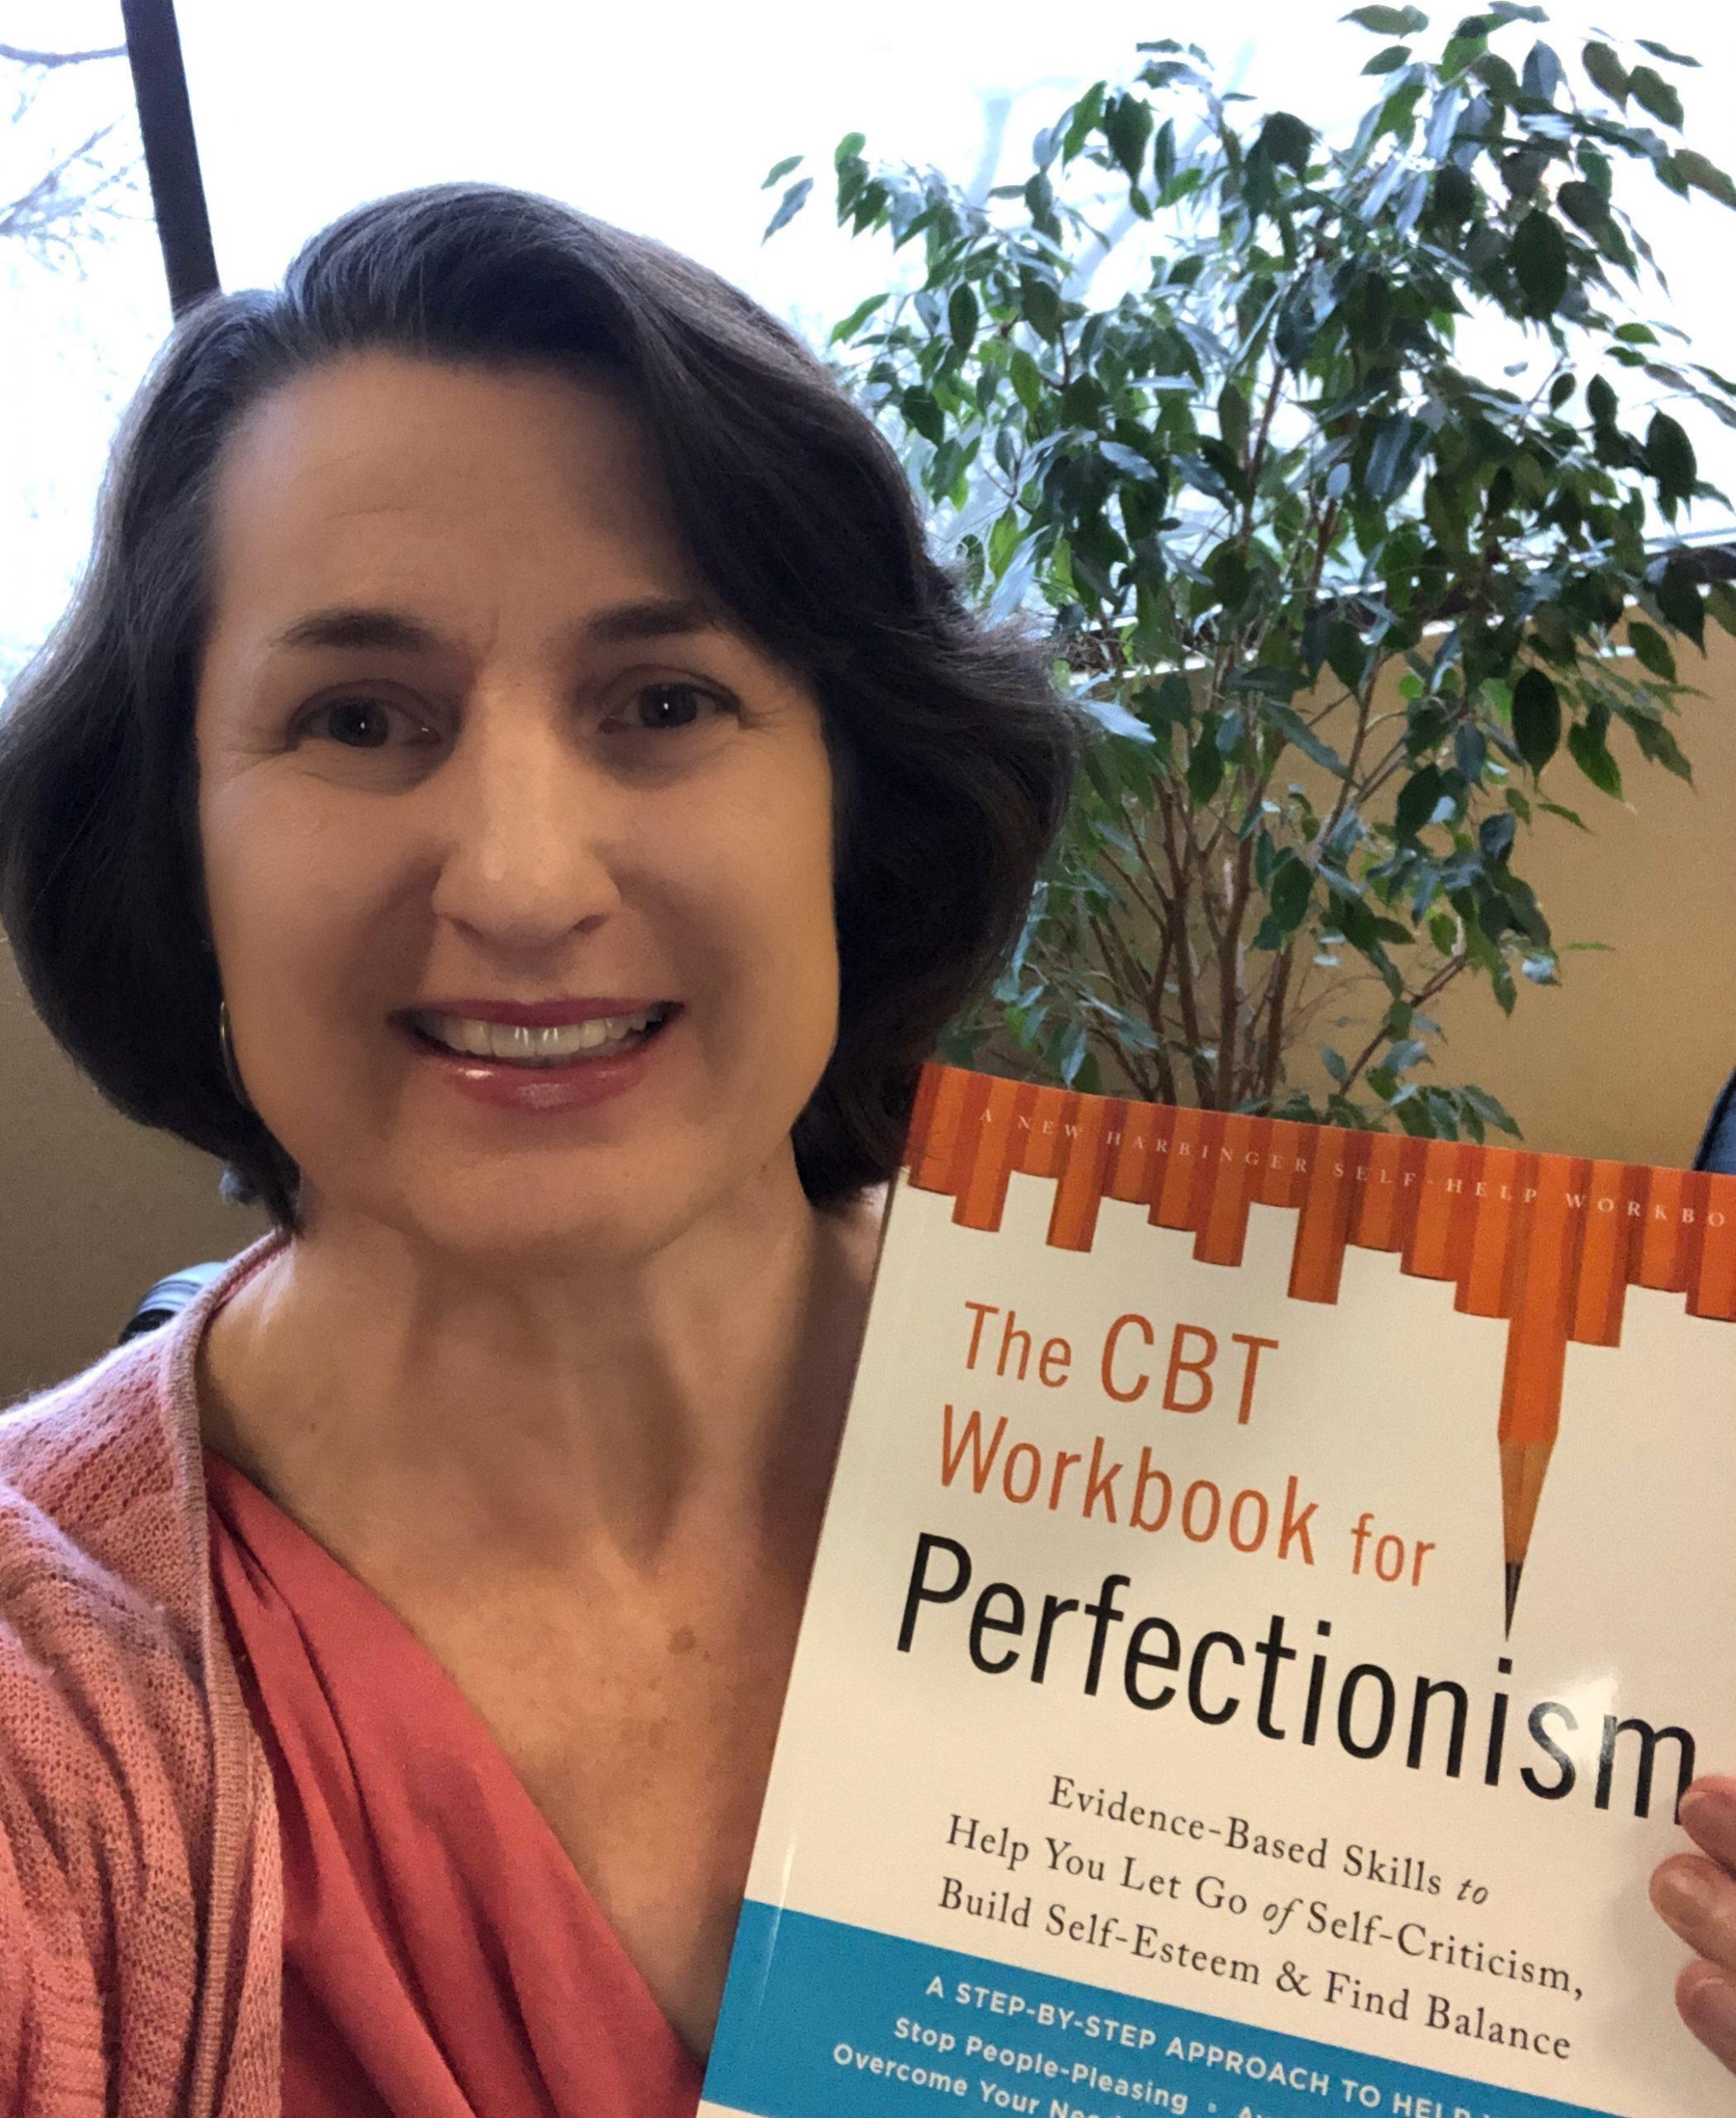 perfectionism workbook